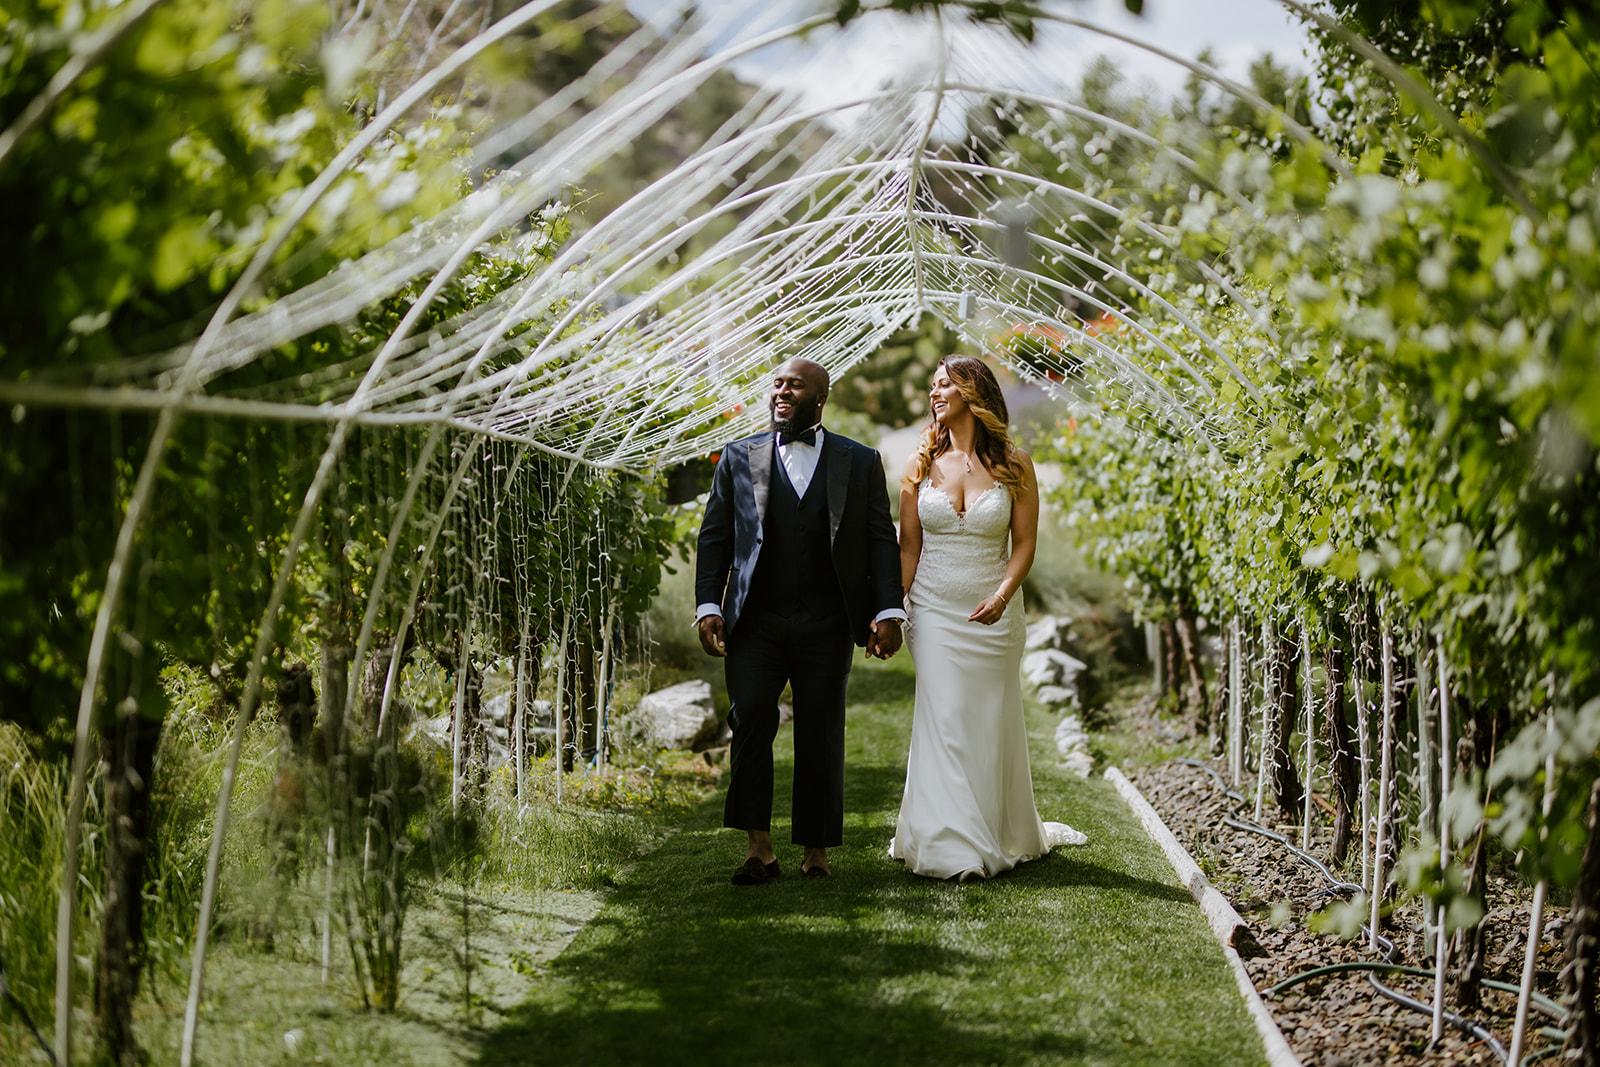 Danielle + Shey- Wedding Photos - Karma Vineyards - Sneak Peeks! - Meme Urbane Photography-11_websize.jpg